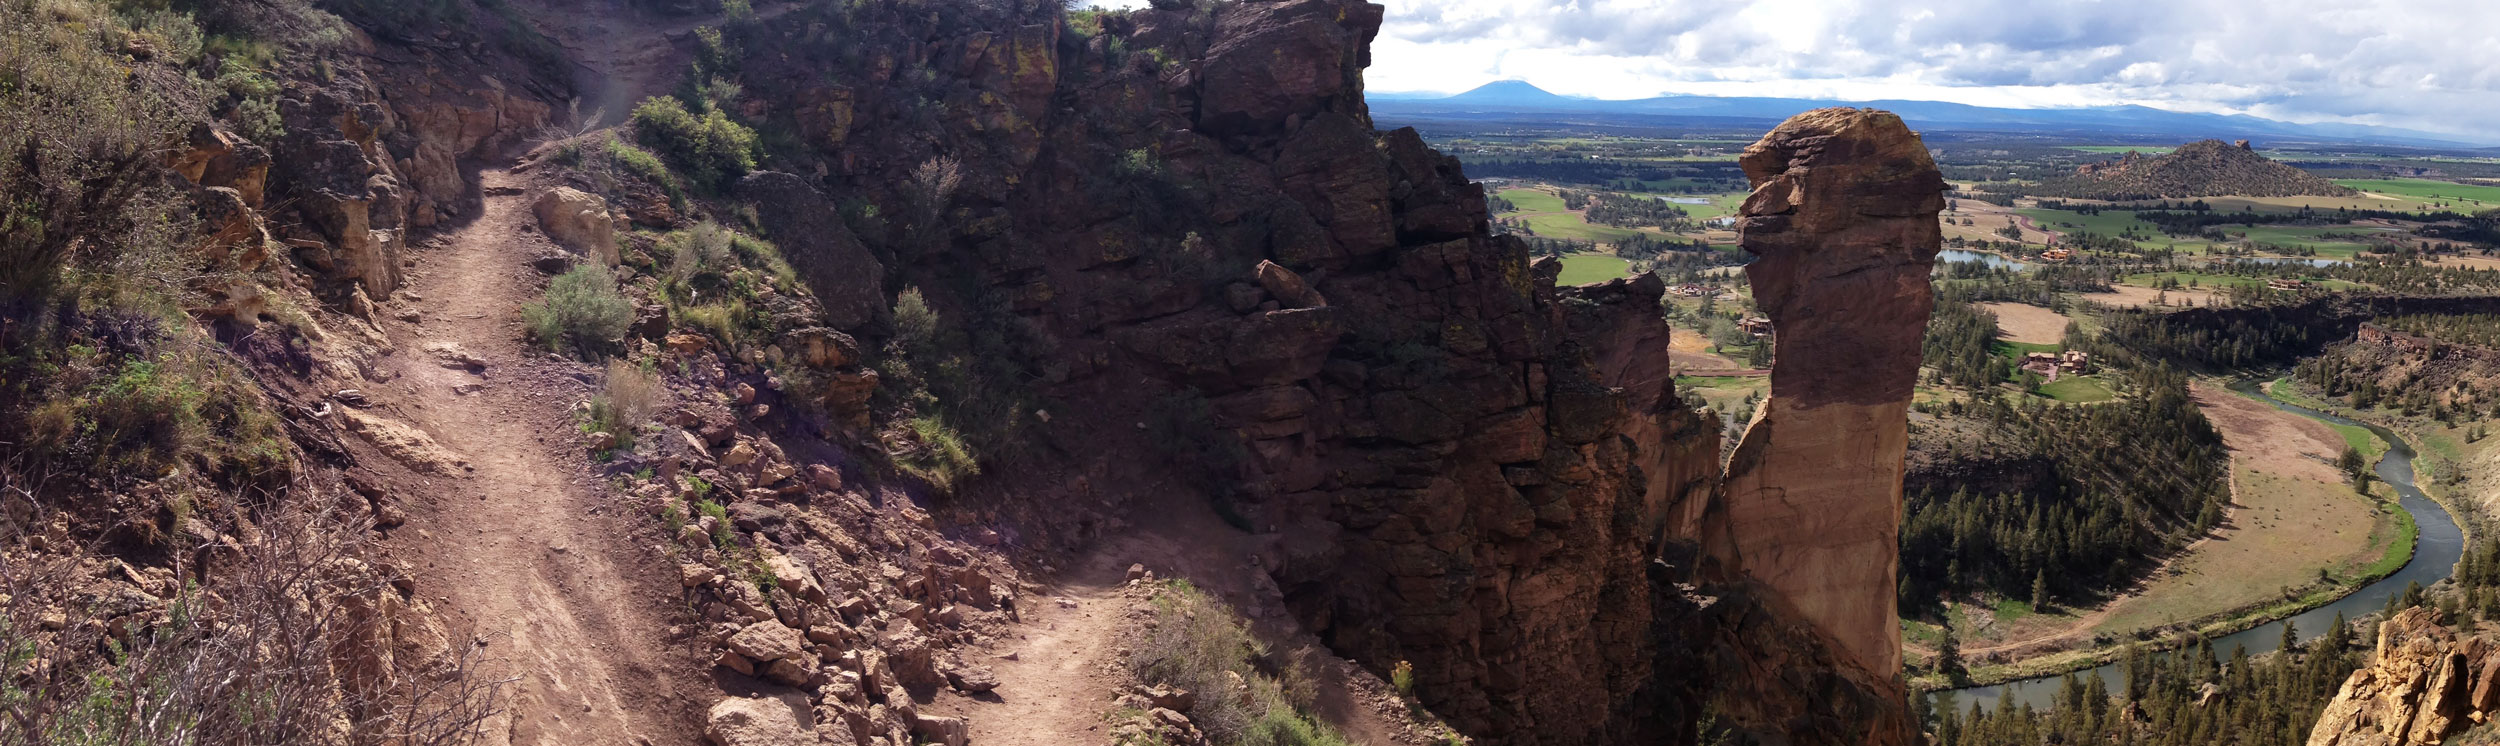 misery ridge loop - trail run